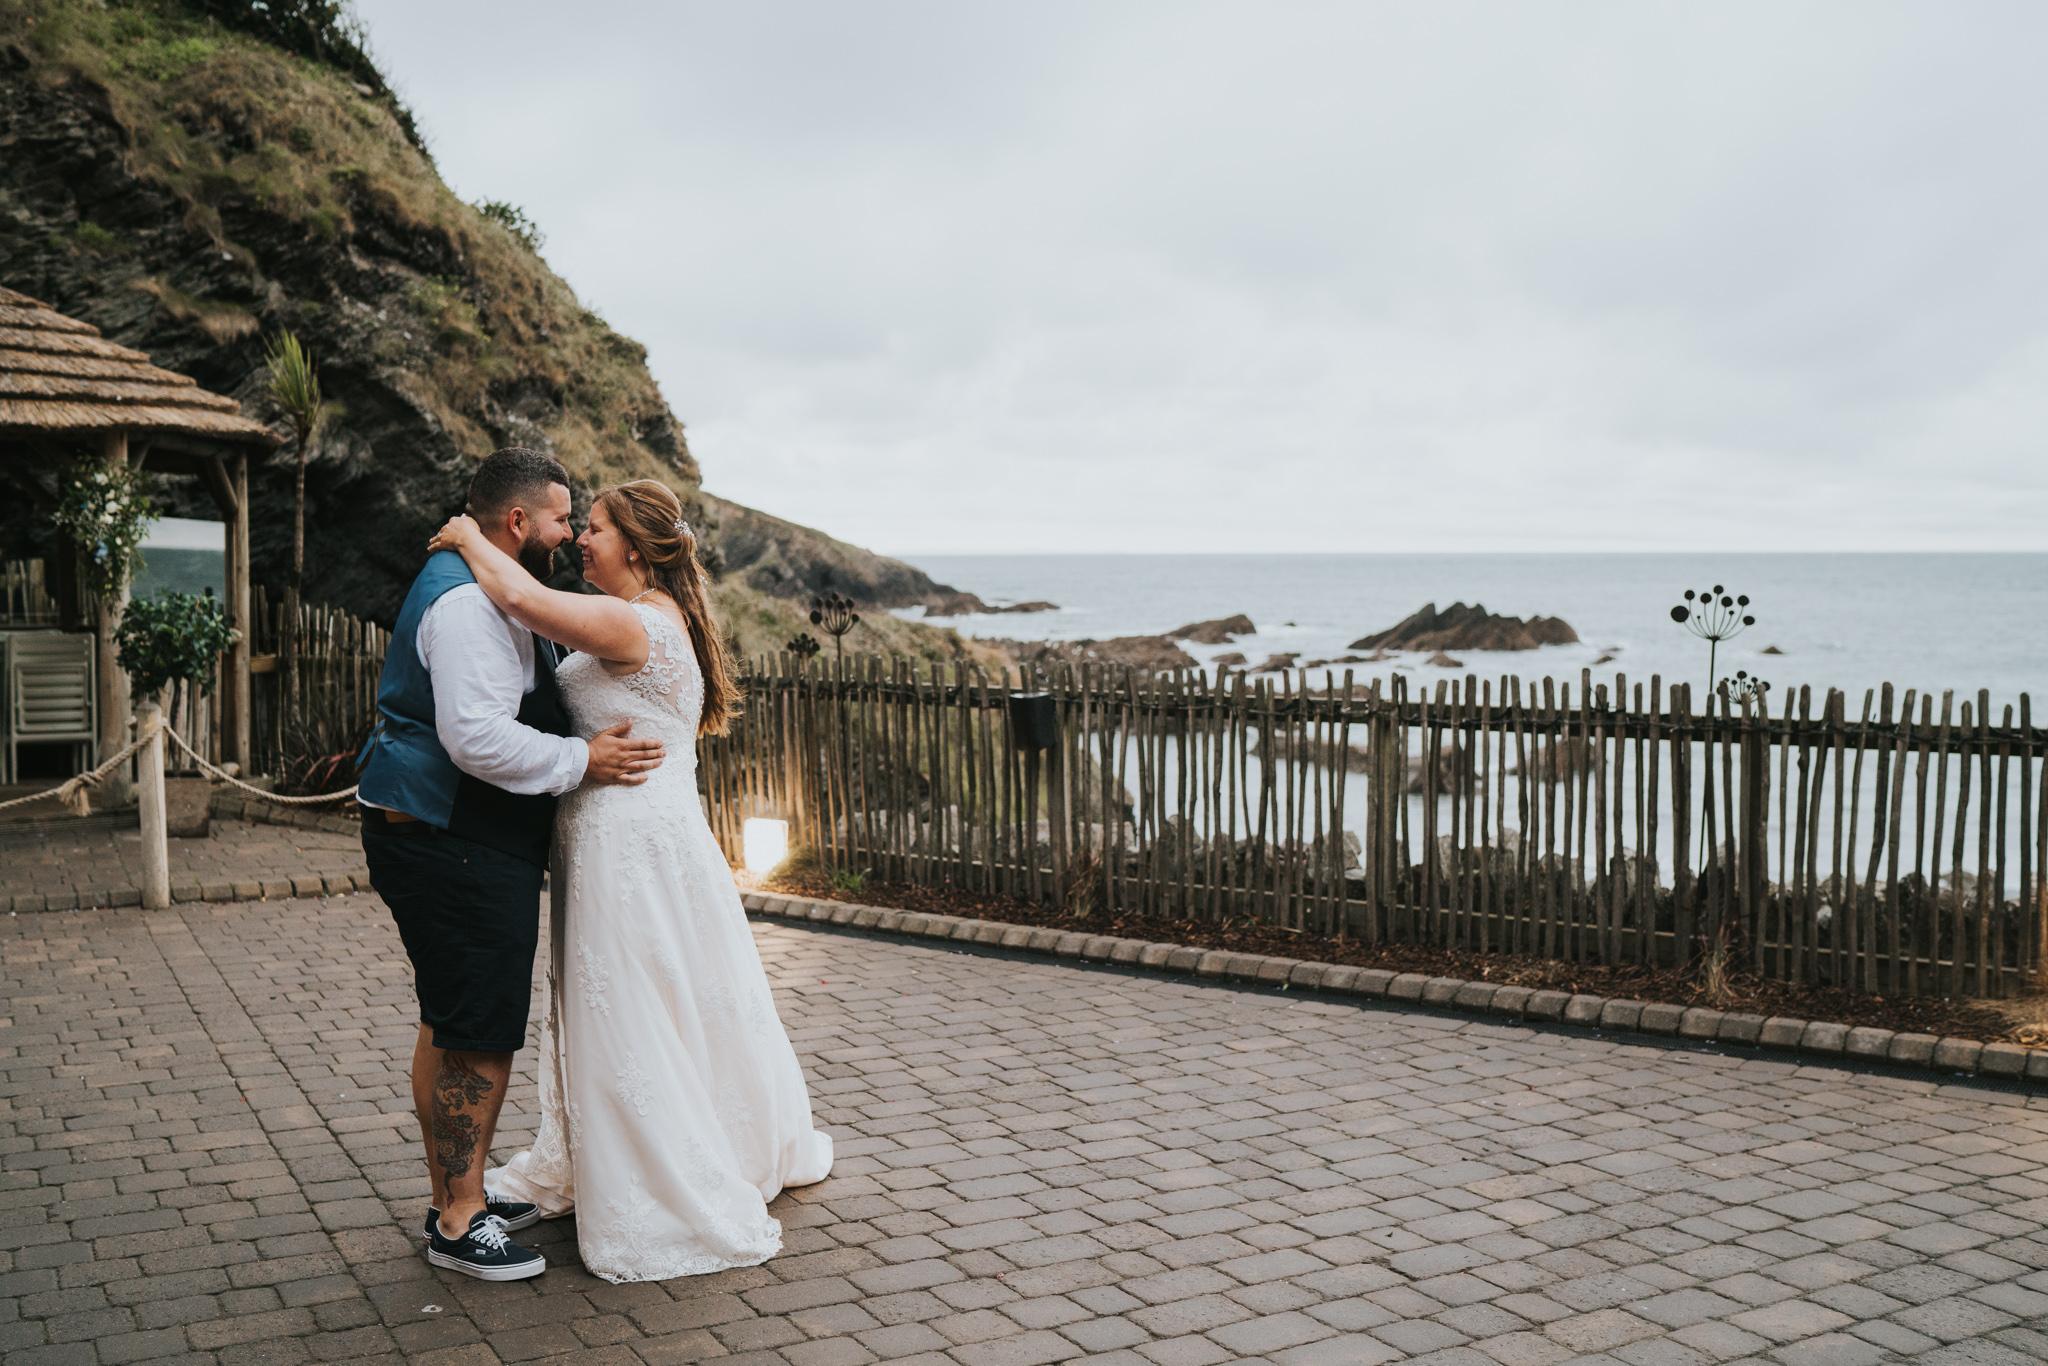 john-amy-relaxed-beach-wedding-tunnels-beaches-ilfracombe-north-devon-grace-elizabeth-colchester-essex-alternative-relaxed-wedding-photography-devon-suffolk-norfolk-essex (145 of 159).jpg